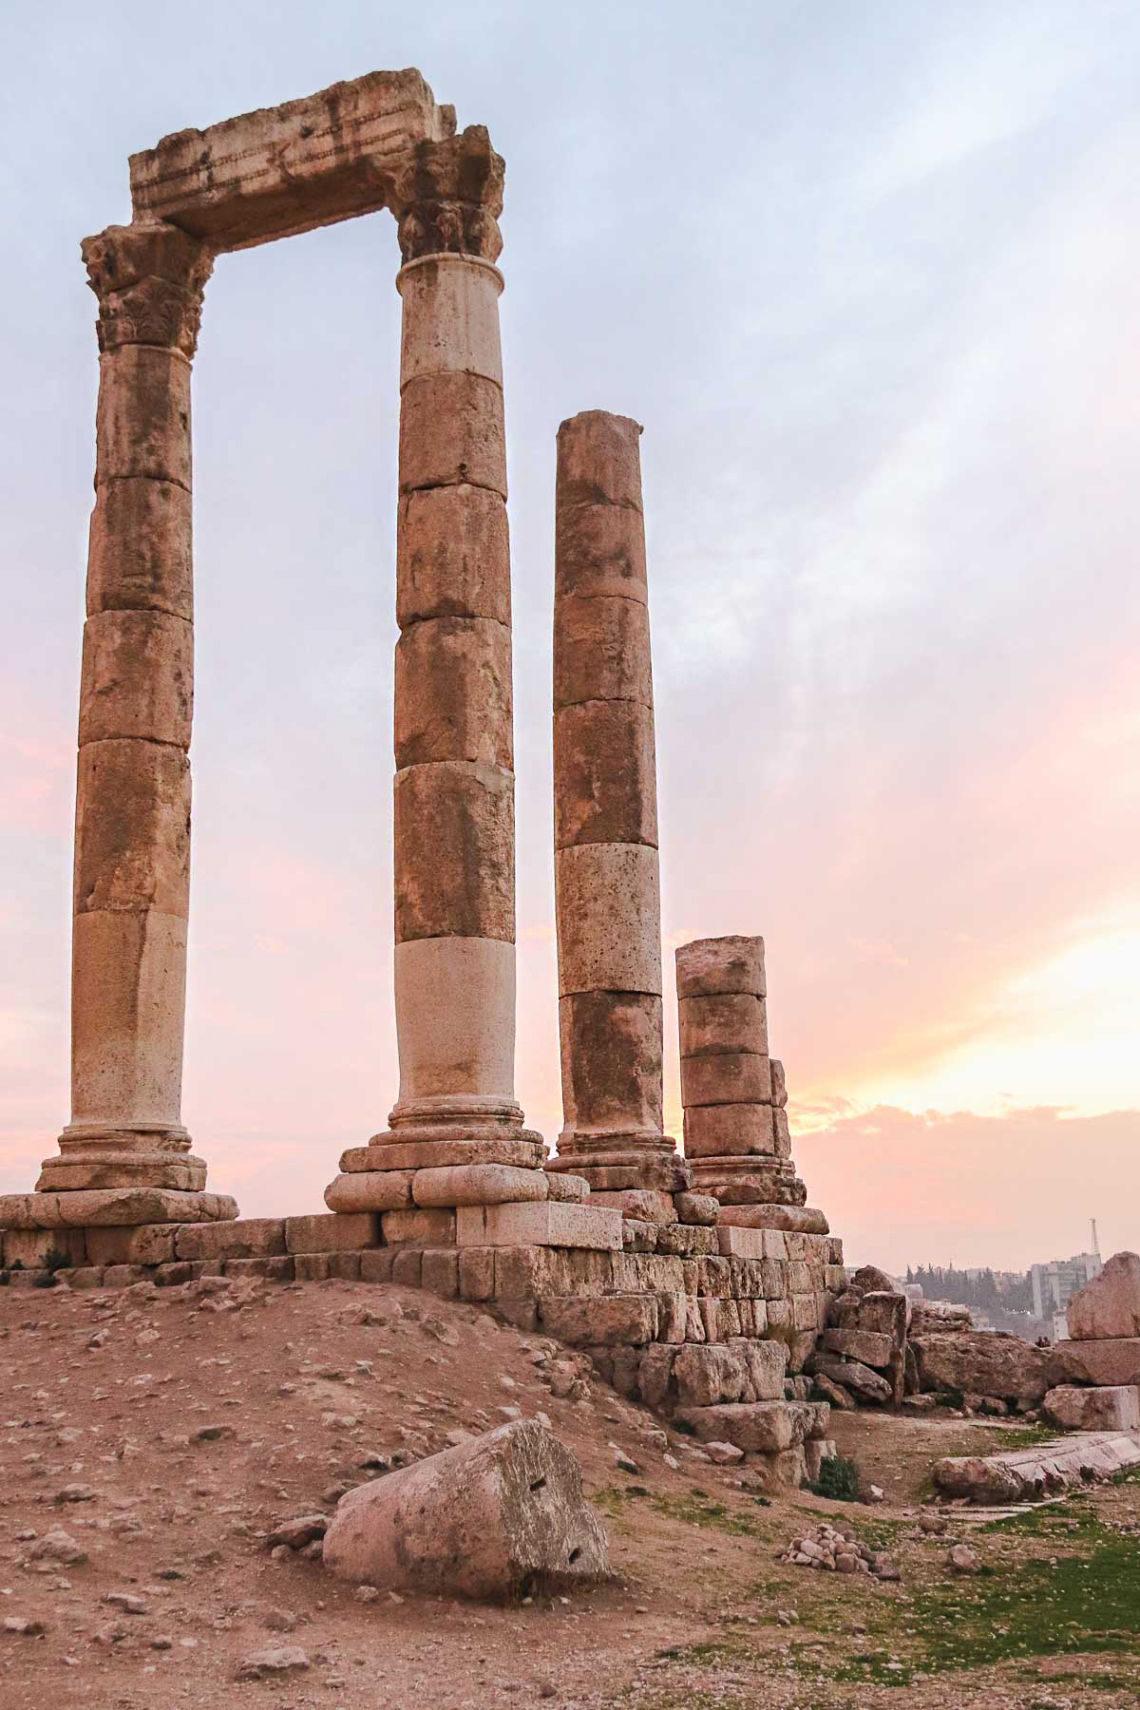 Amman citadel at sunset